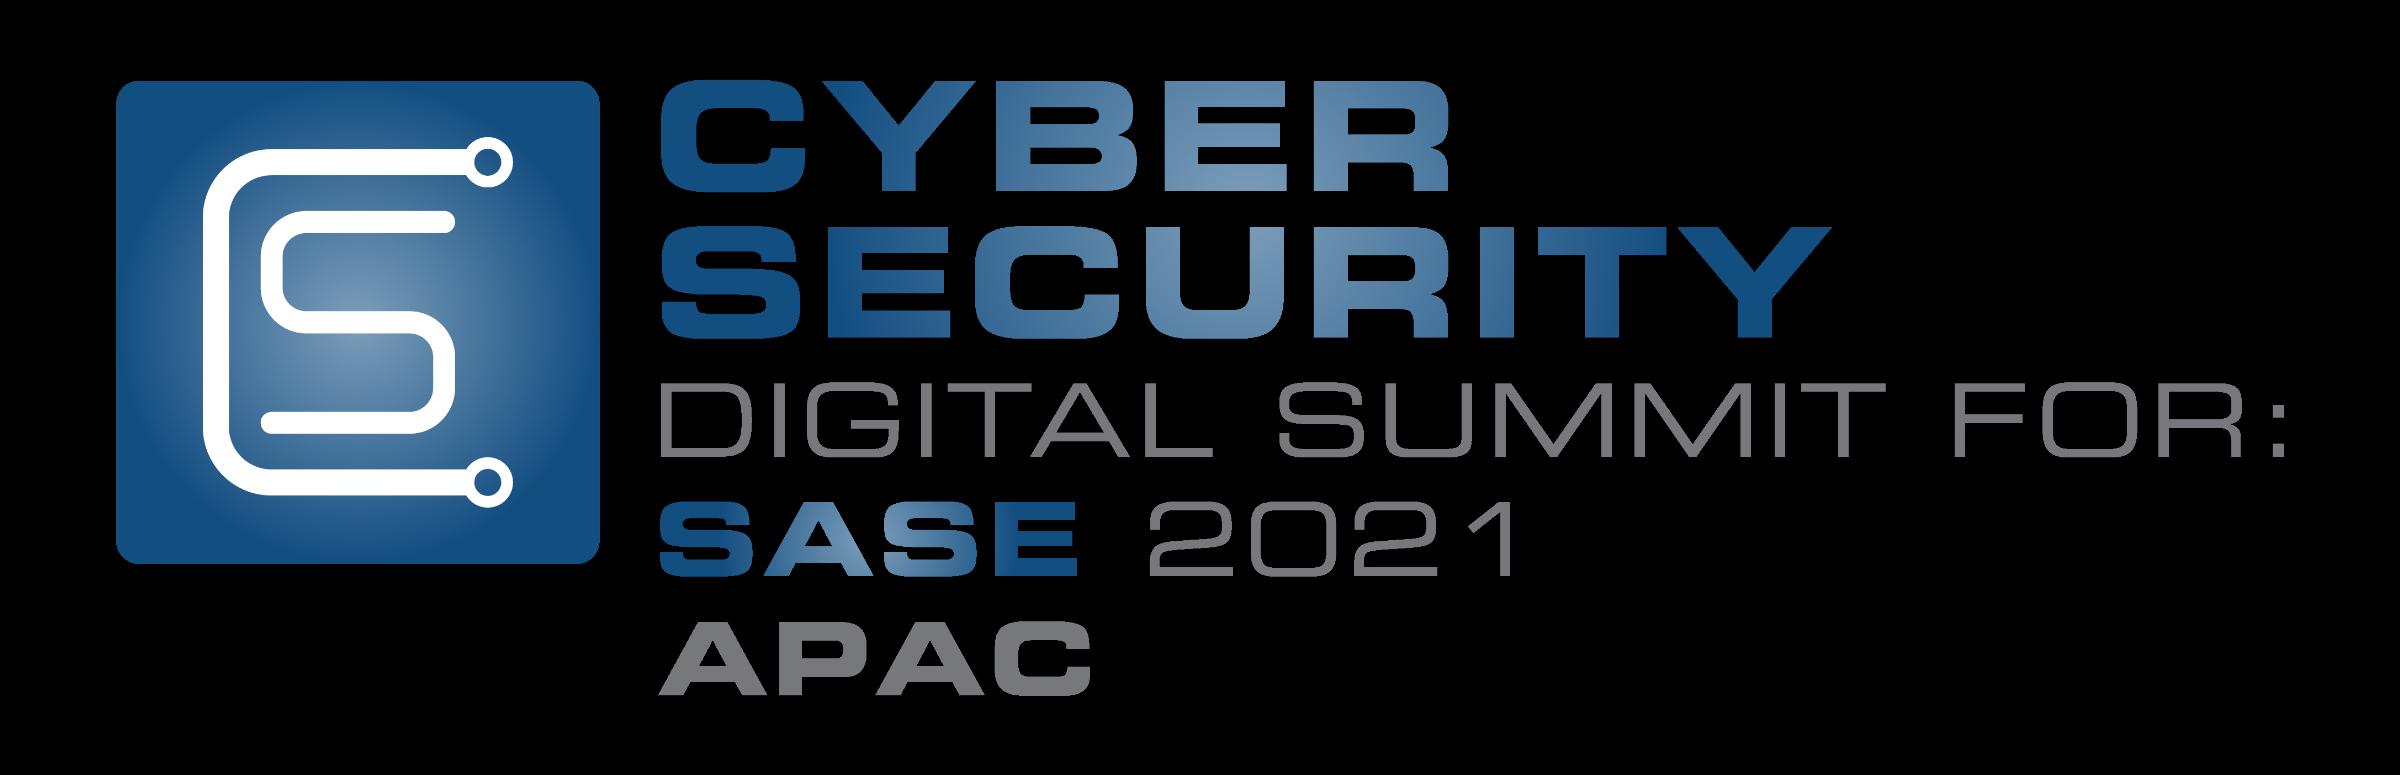 Cyber Security Digital Summit: SASE APAC 2021